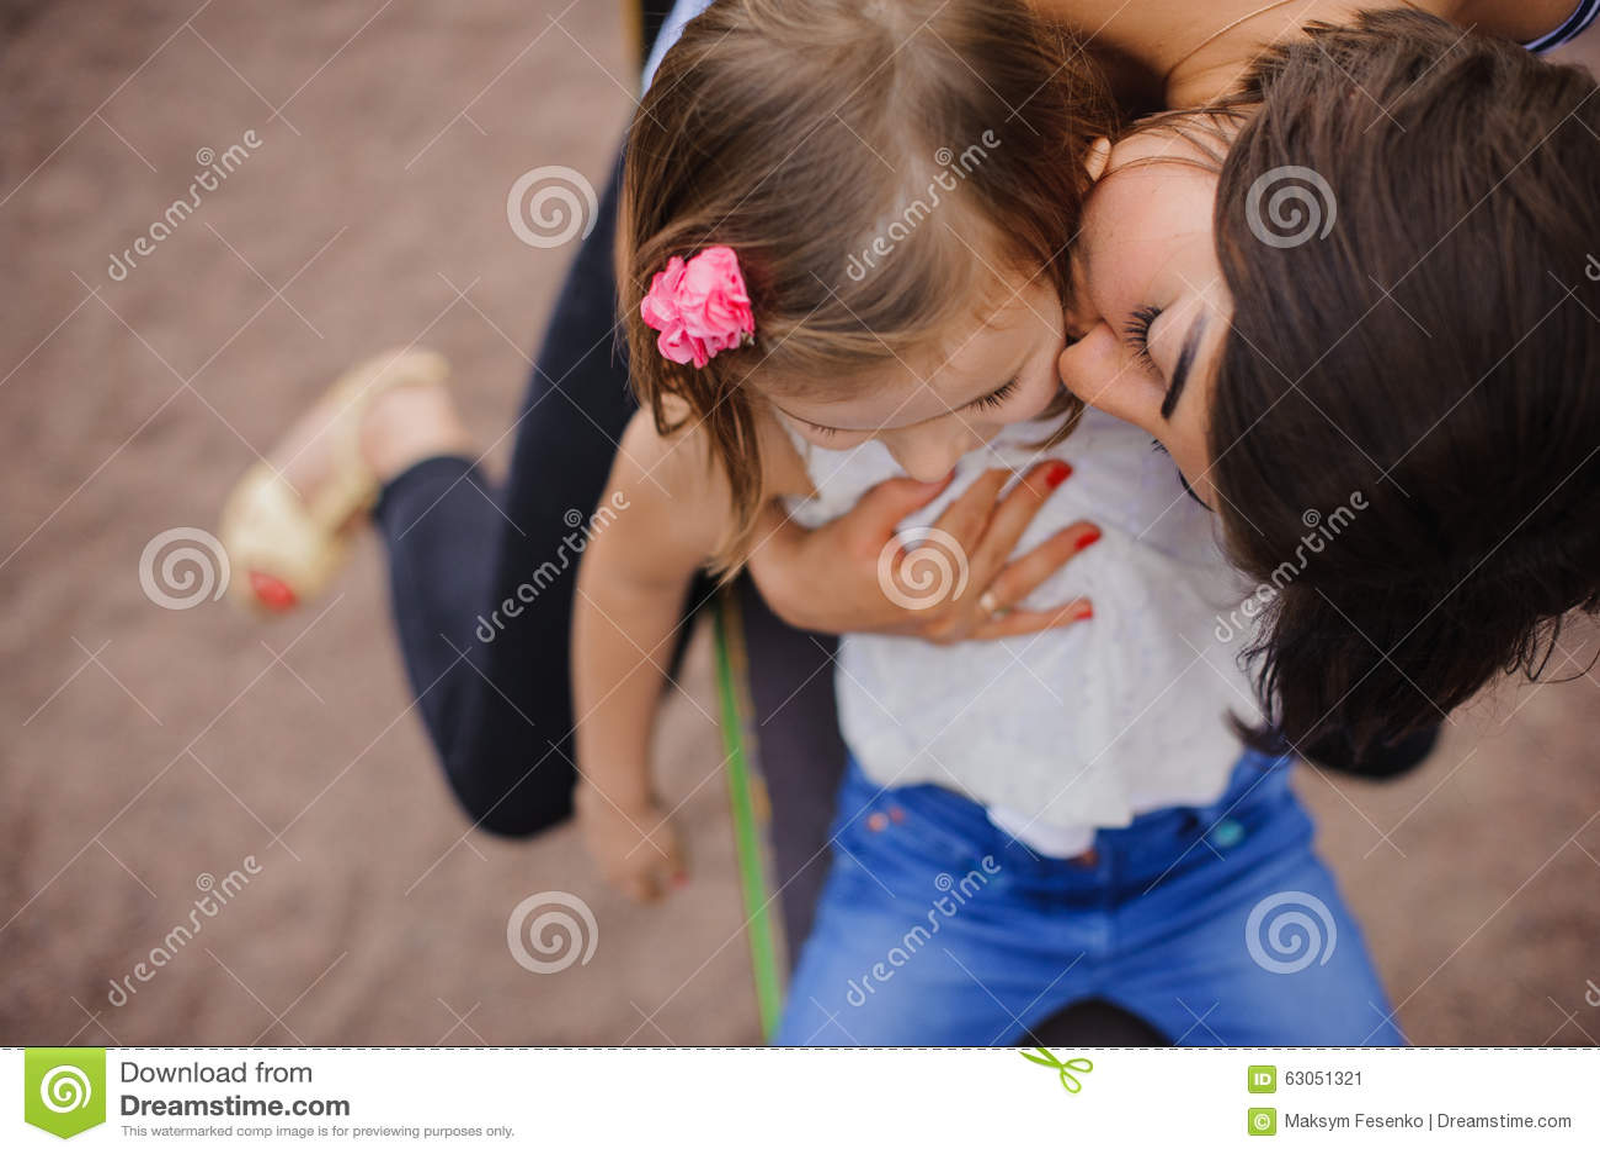 Mère affectueuse embrassant sa fille